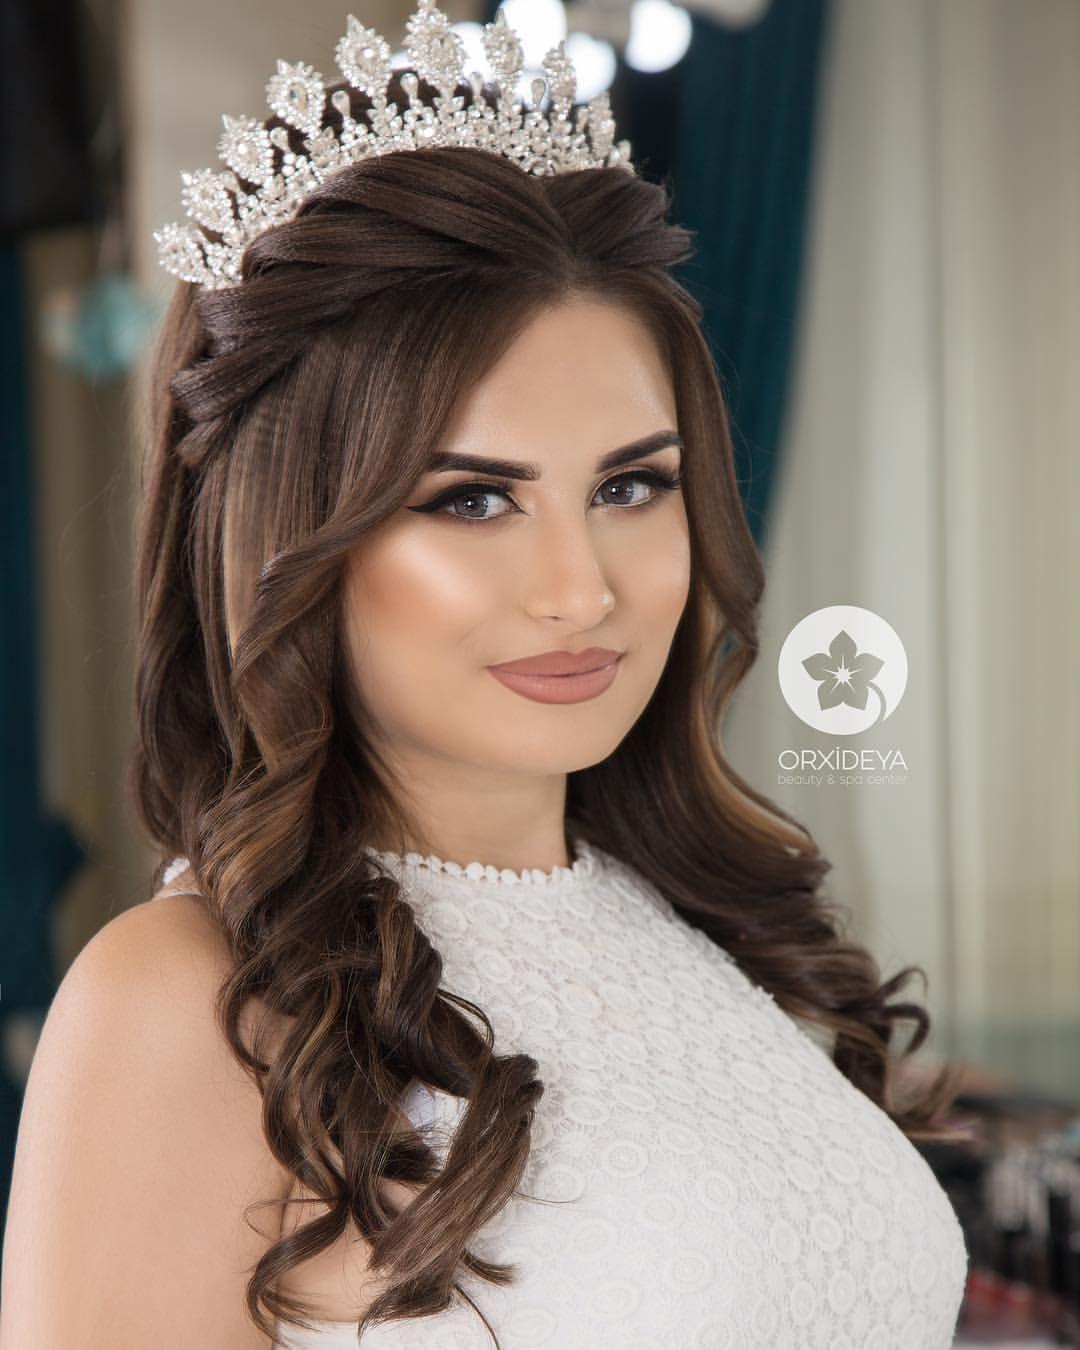 Gozelim Sac Mene Makiaj Makeup Artist Afaq Aiddir Orxideyabeauty V Formal Hairstyles Aiddir Gelin Sac Stili Gelin Sac Modelleri Nedime Saci